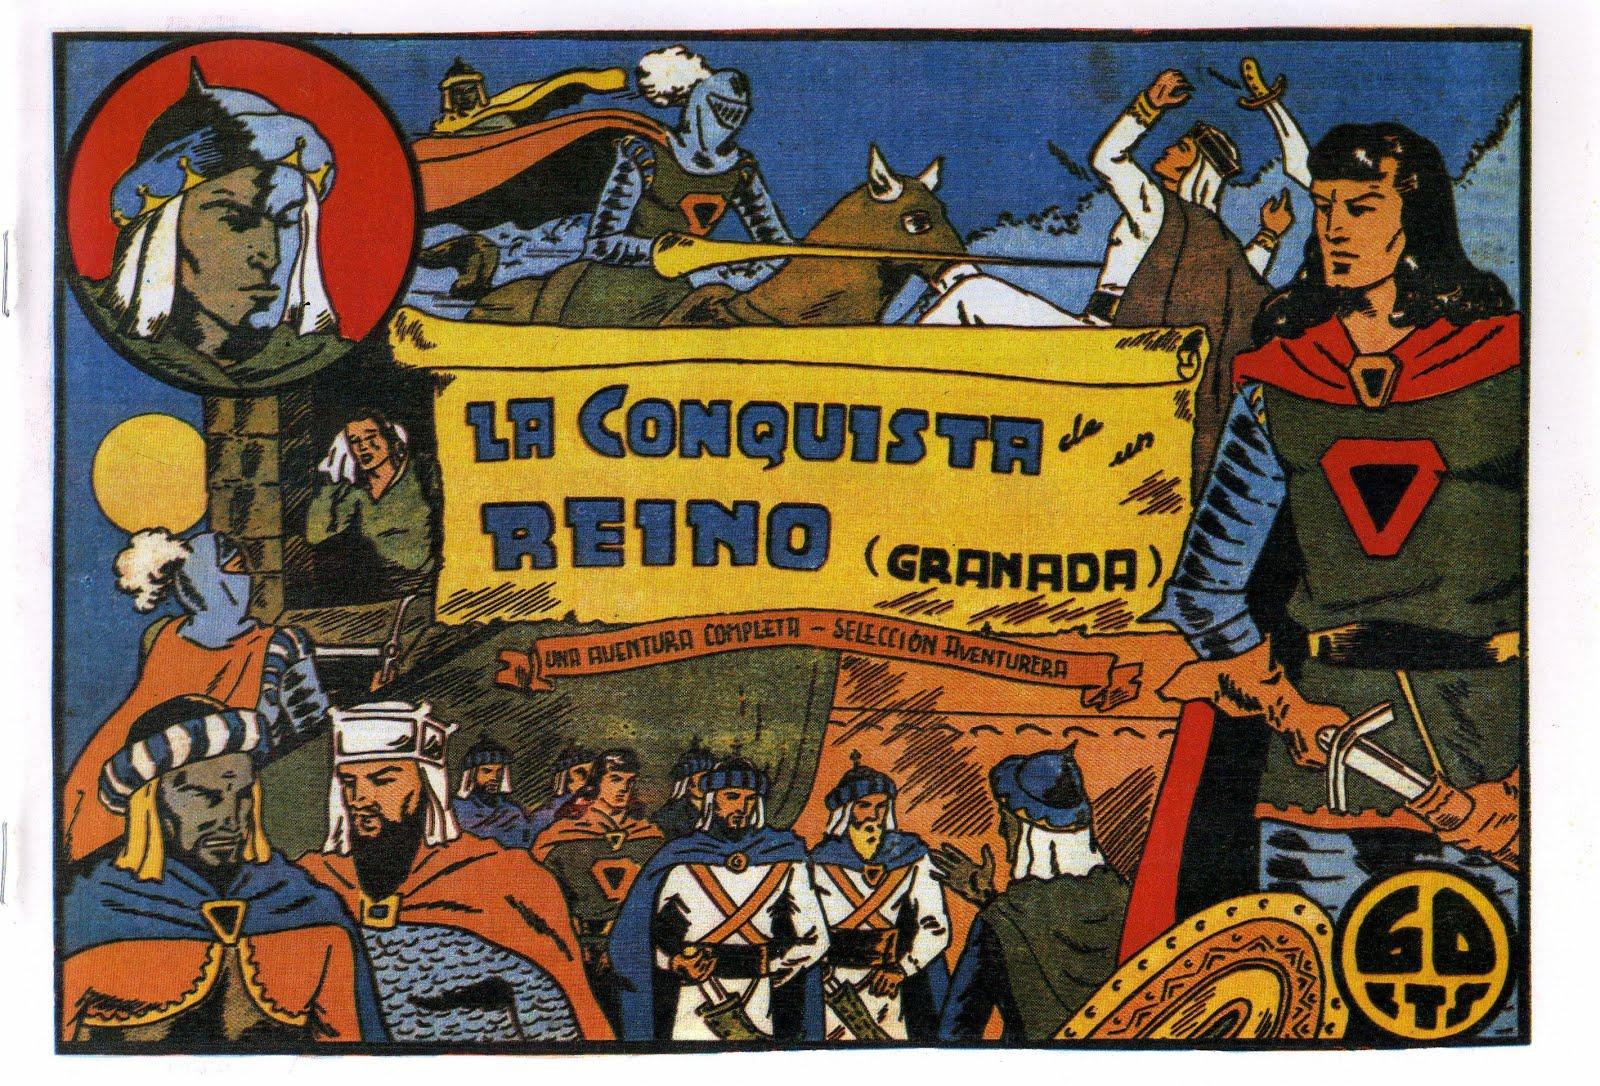 Selección Aventurera, cuadernos monográficos. (Valenciana 1941)